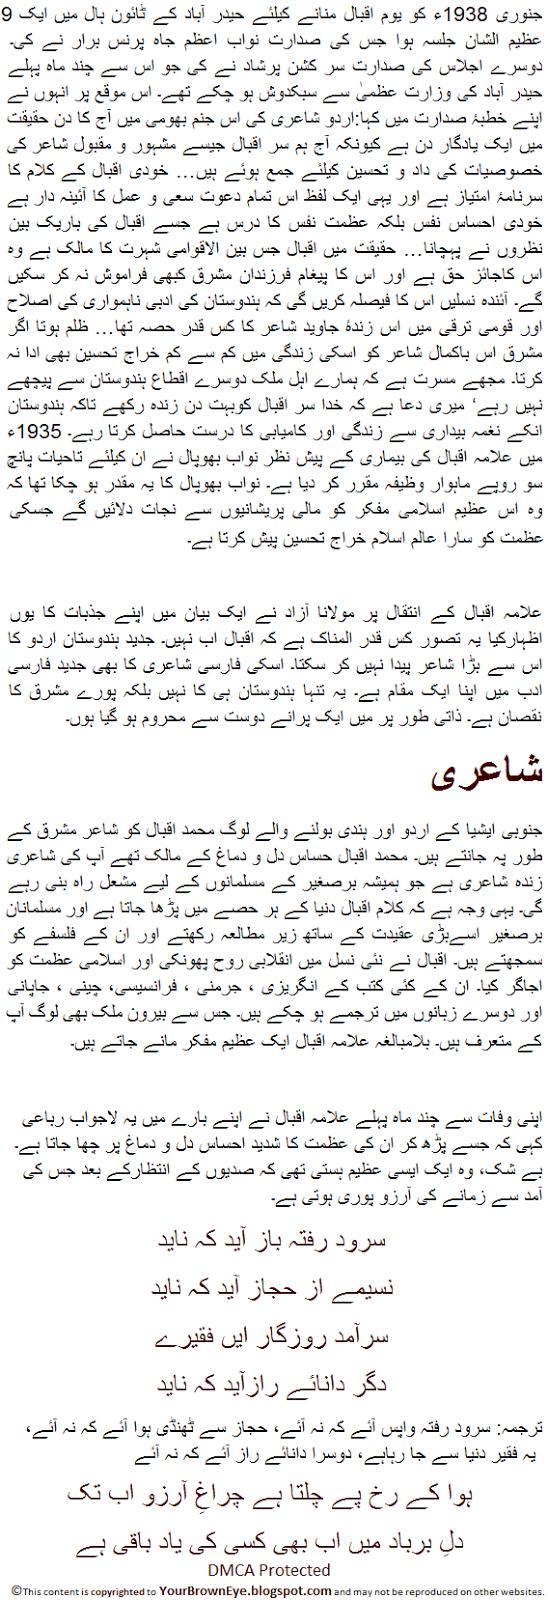 allama iqbal essay in urdu history allama iqbal speech in english allama iqbal poetry in urdu